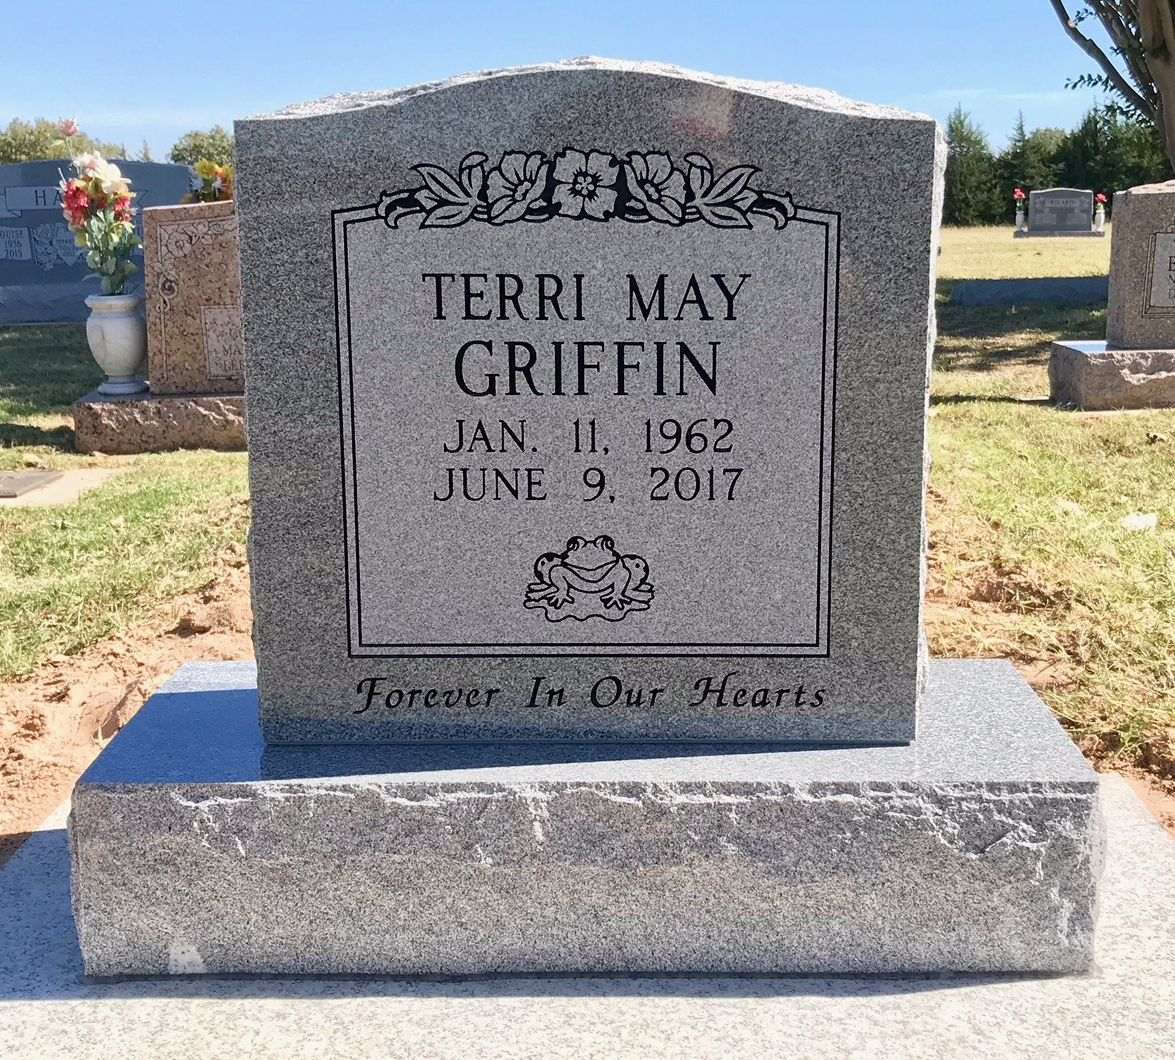 Ga. Gray Upright